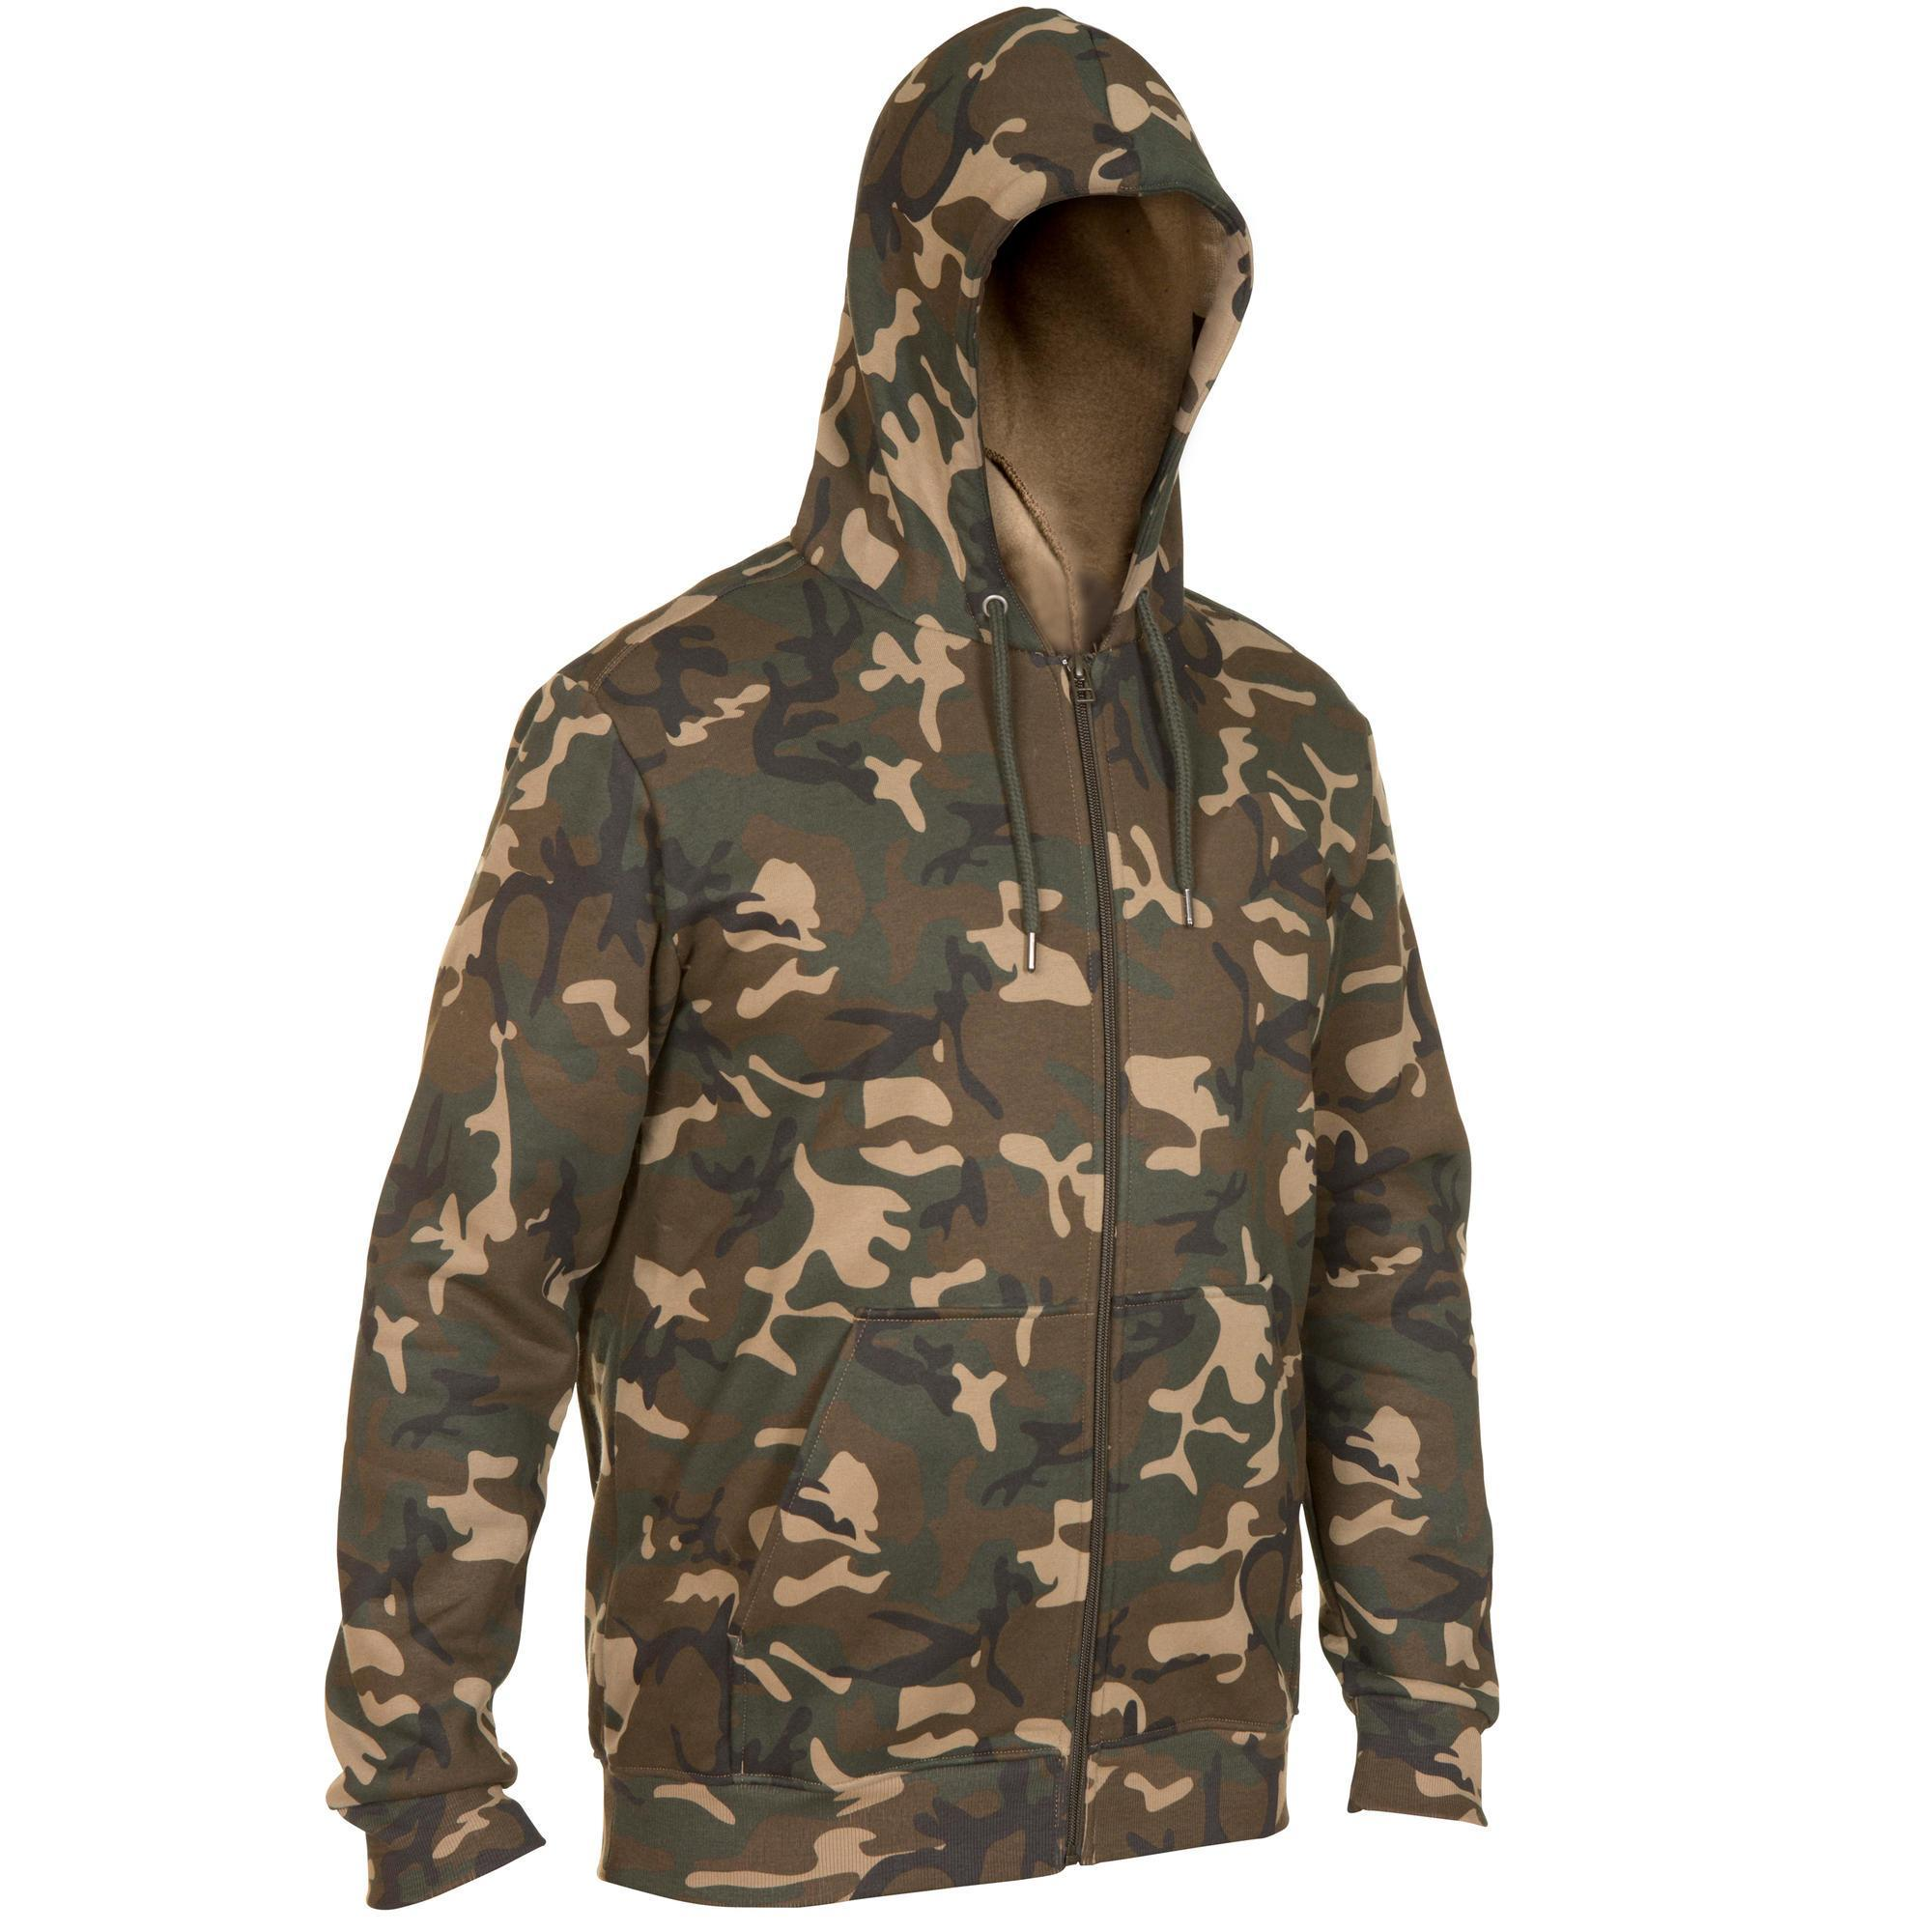 Veste camouflage homme decathlon